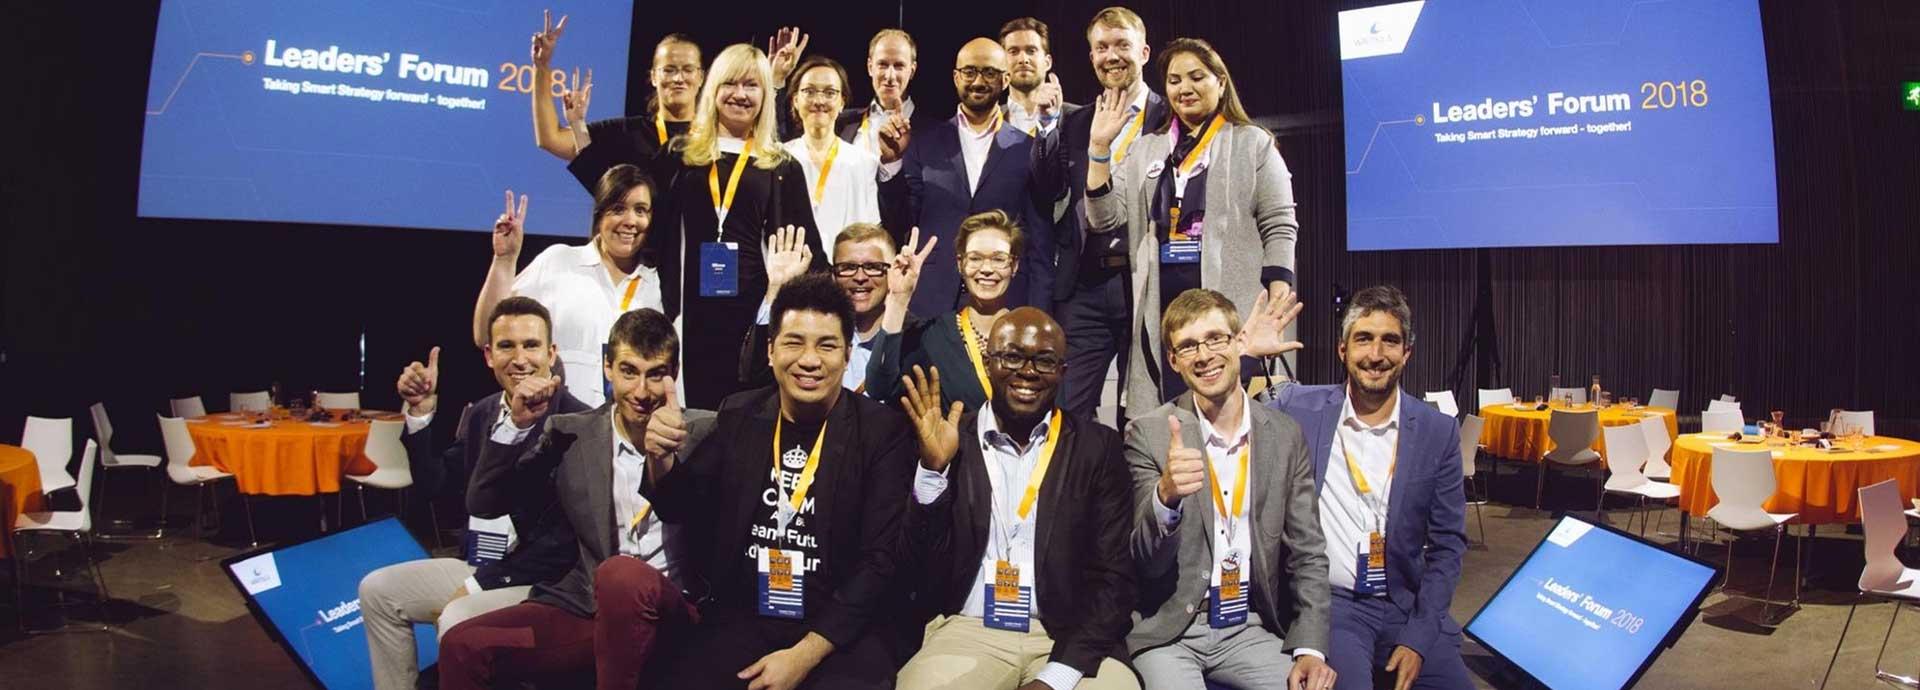 Growth Lab broadens leadership horizons